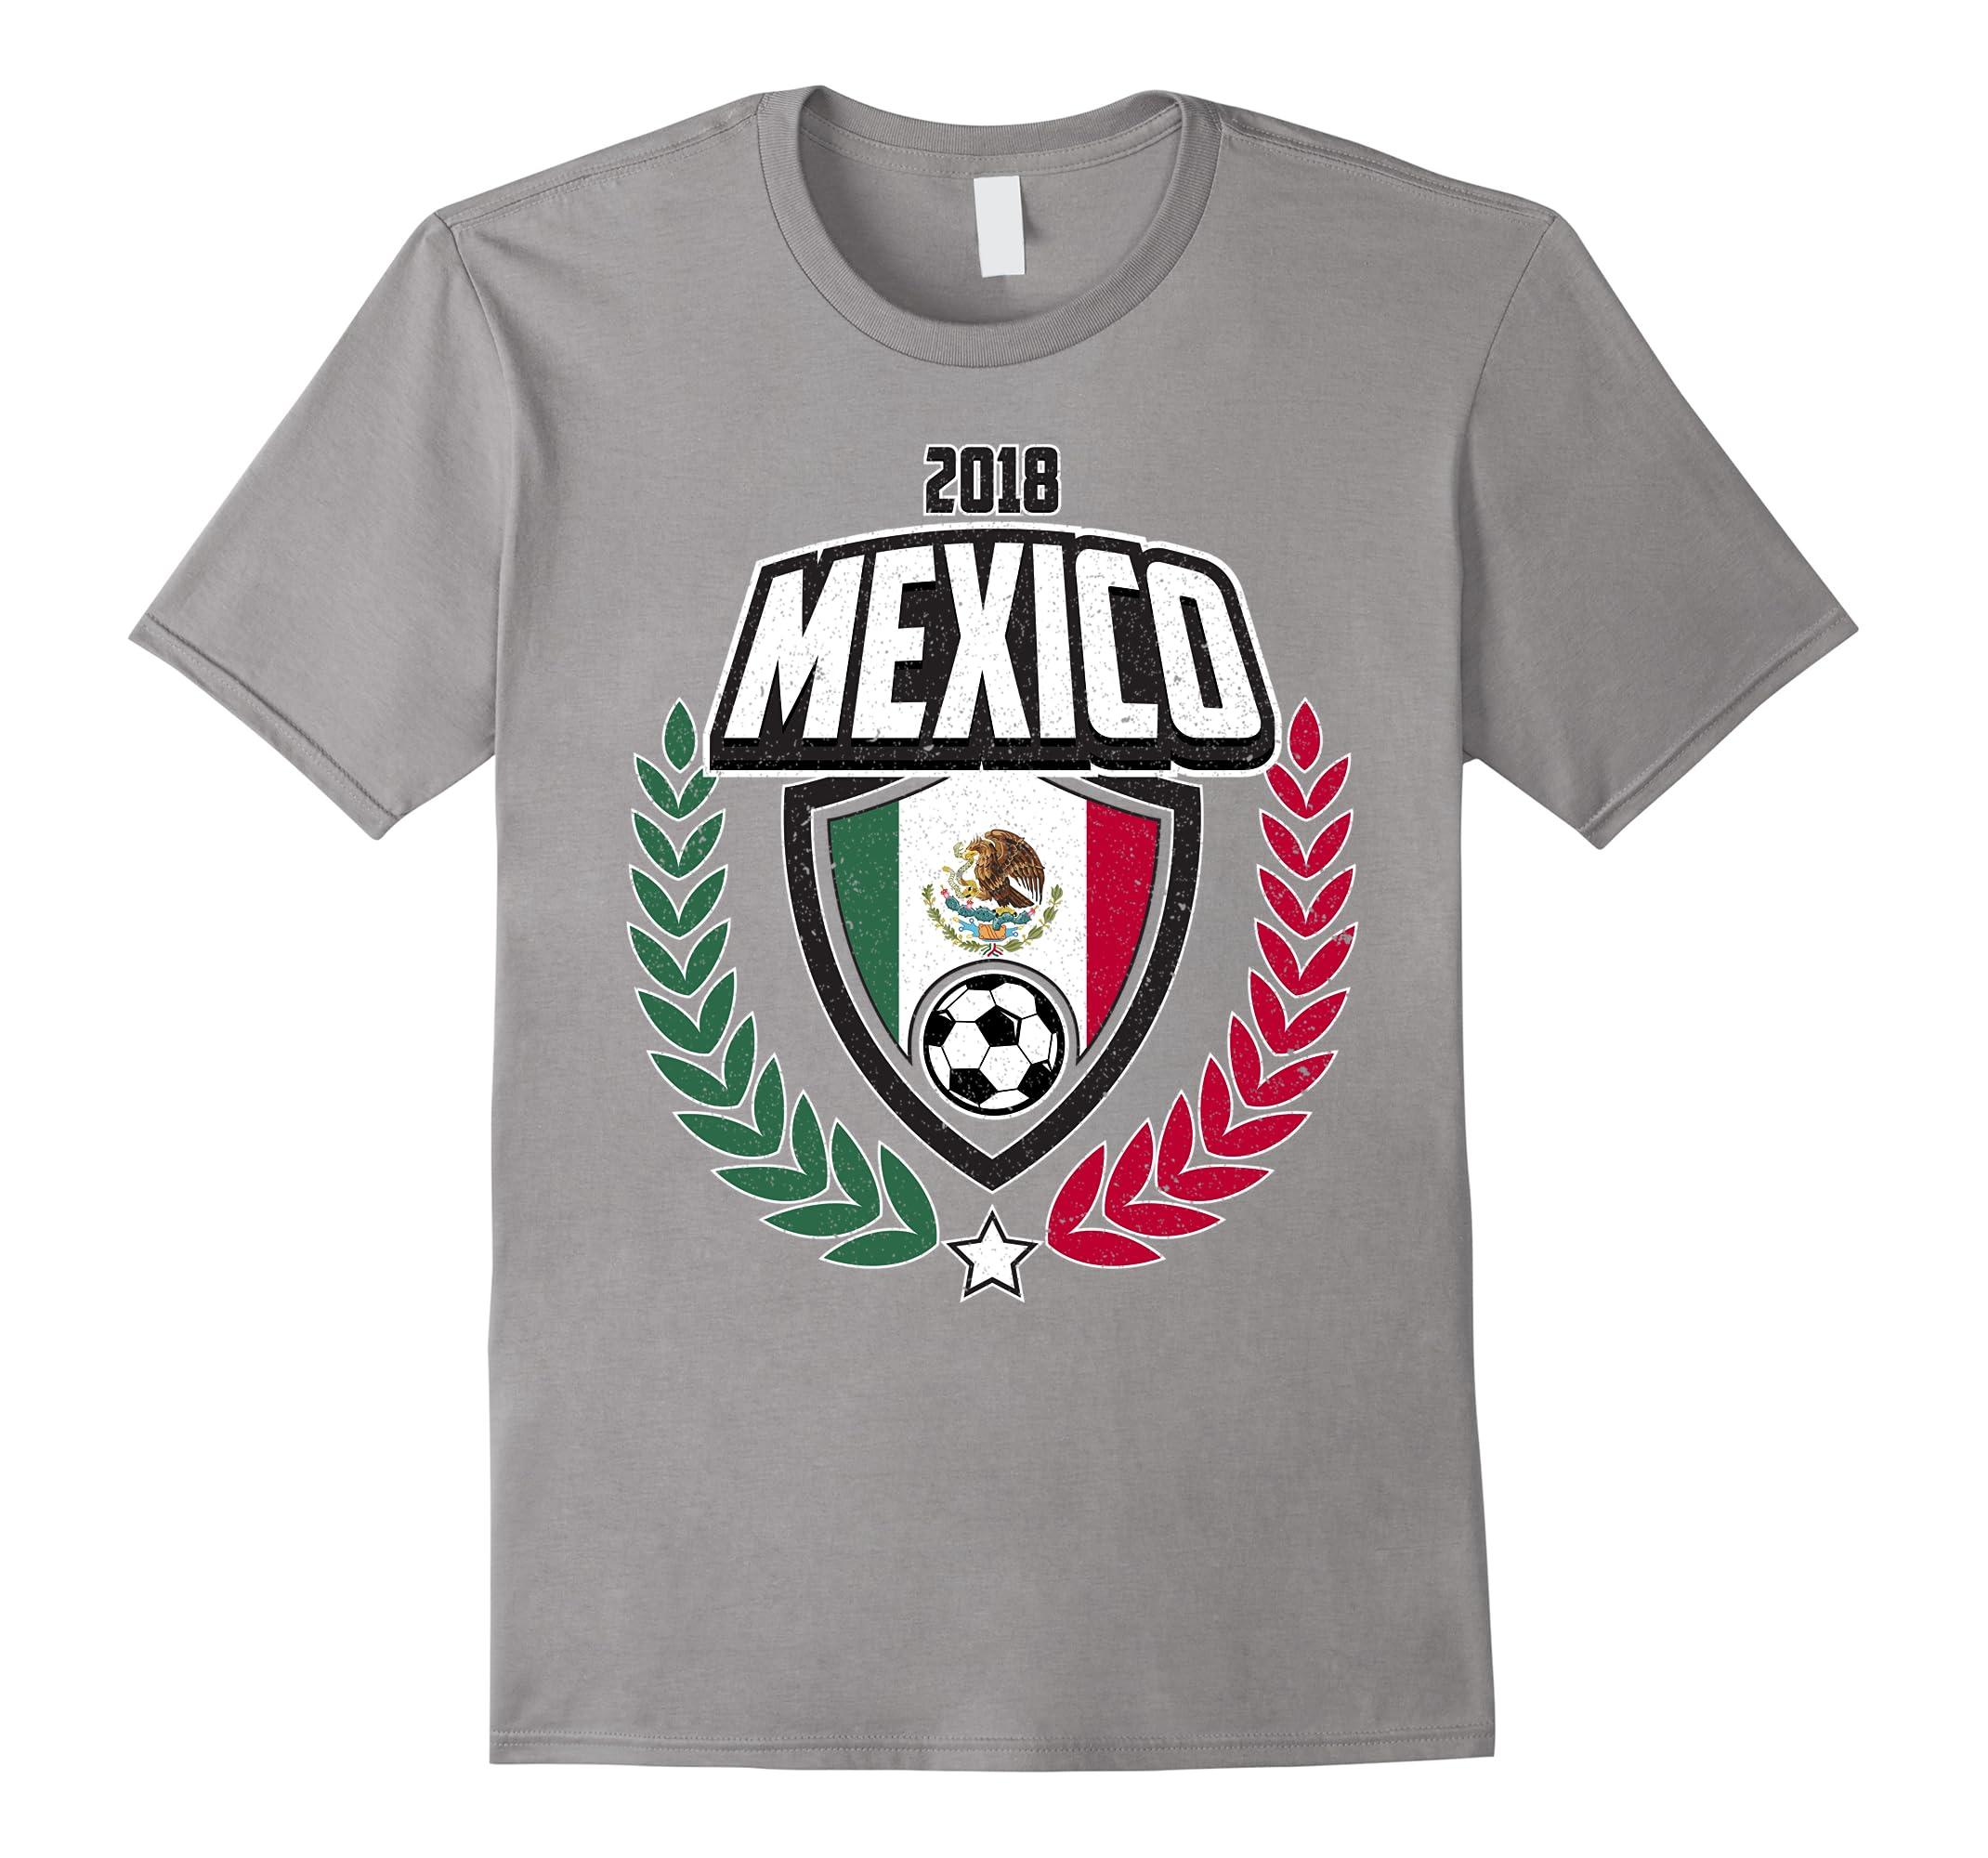 2018 MEXICO Football Shirt-ah my shirt one gift